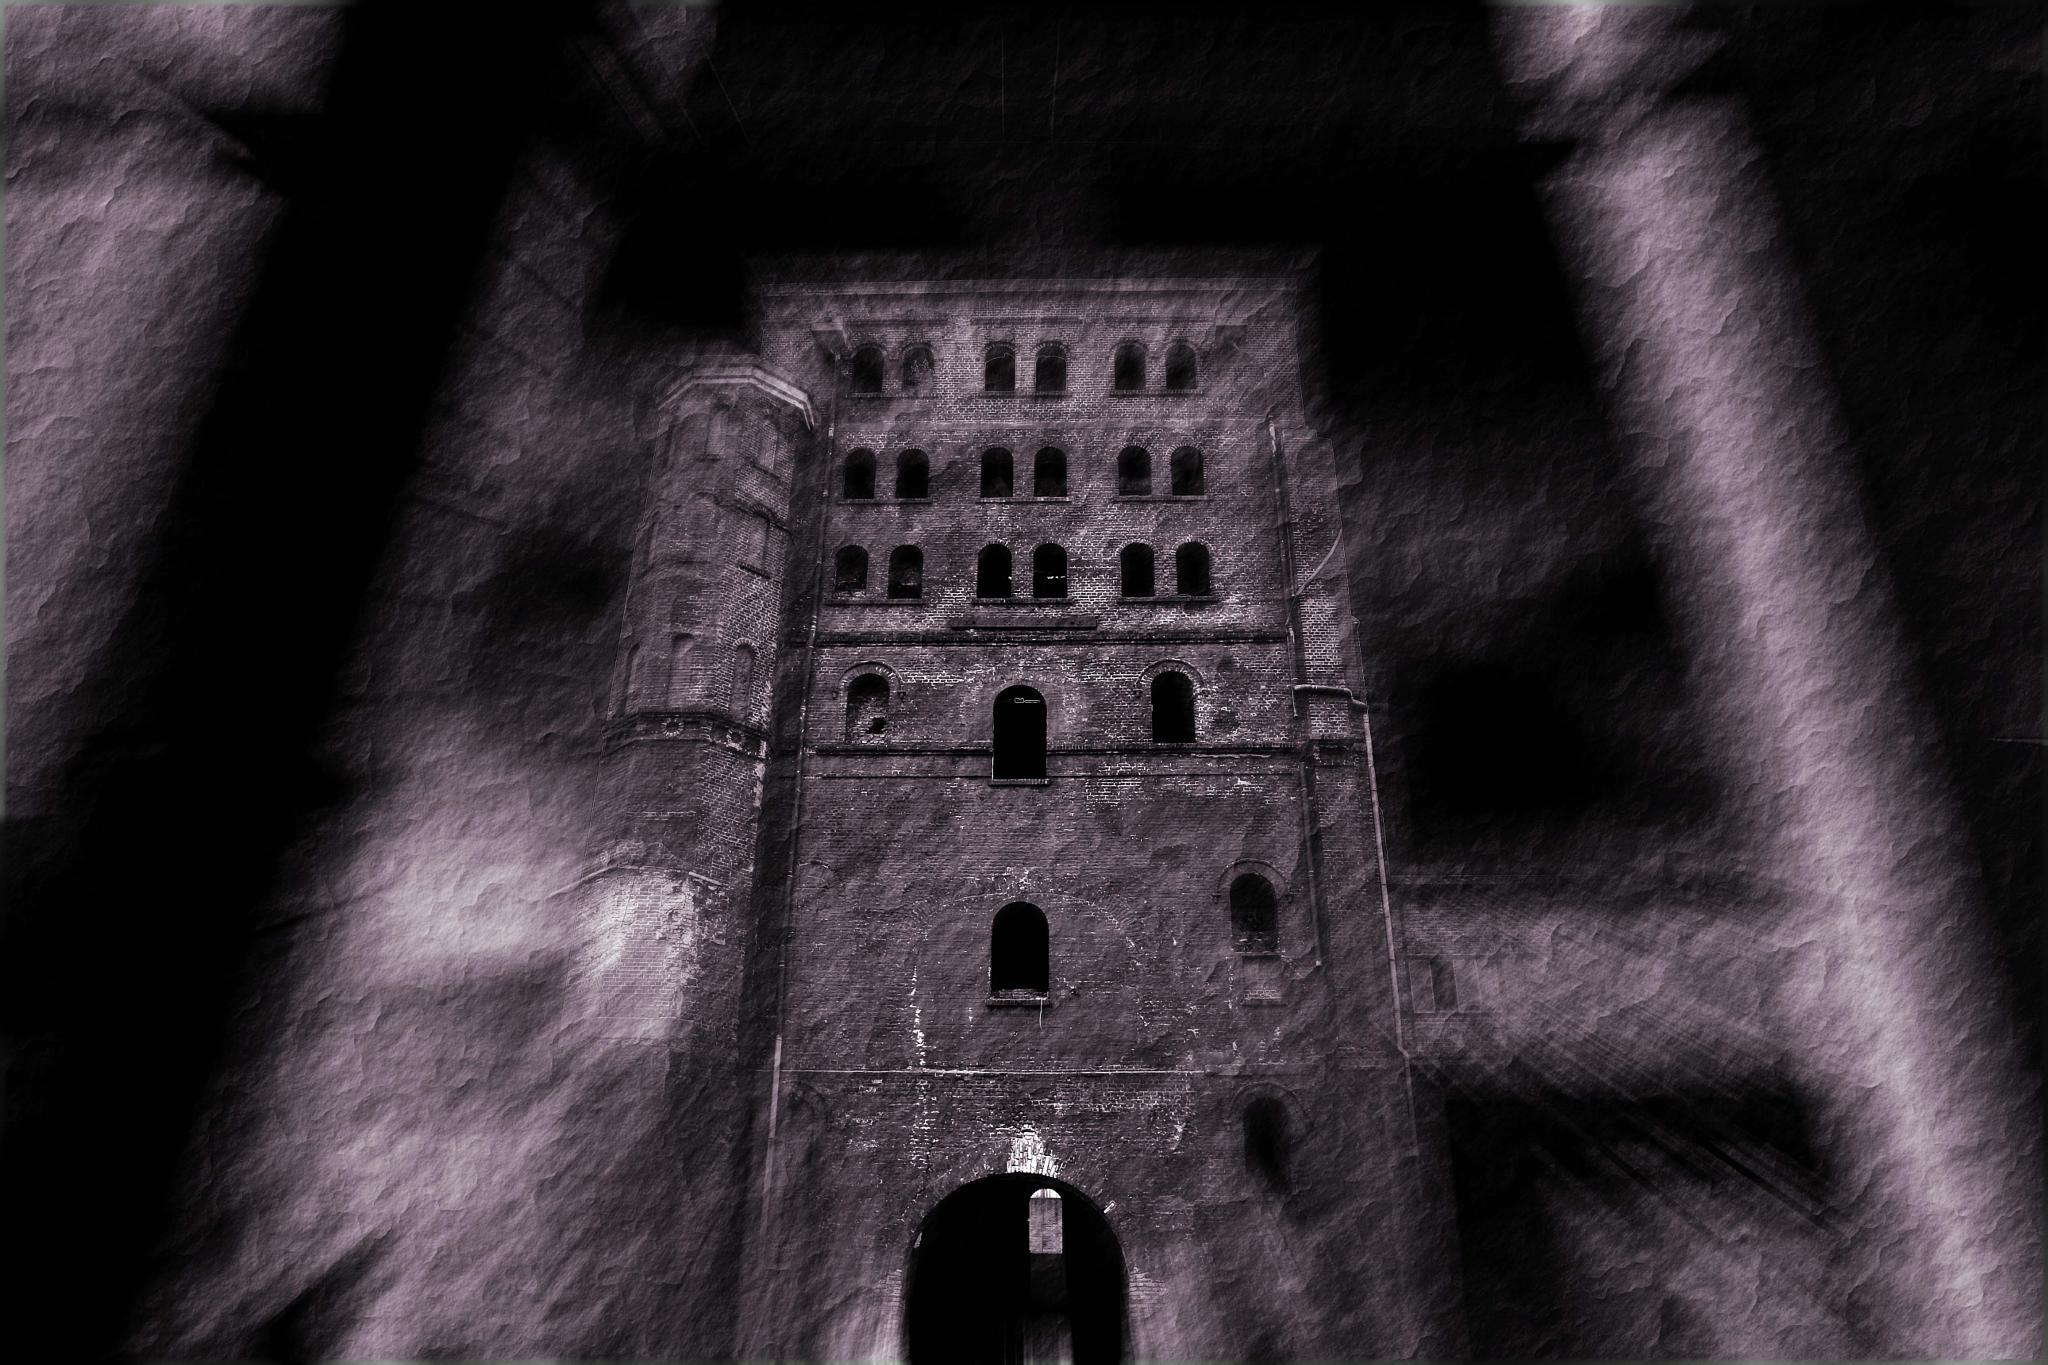 haunted house by Jürgen Cordt